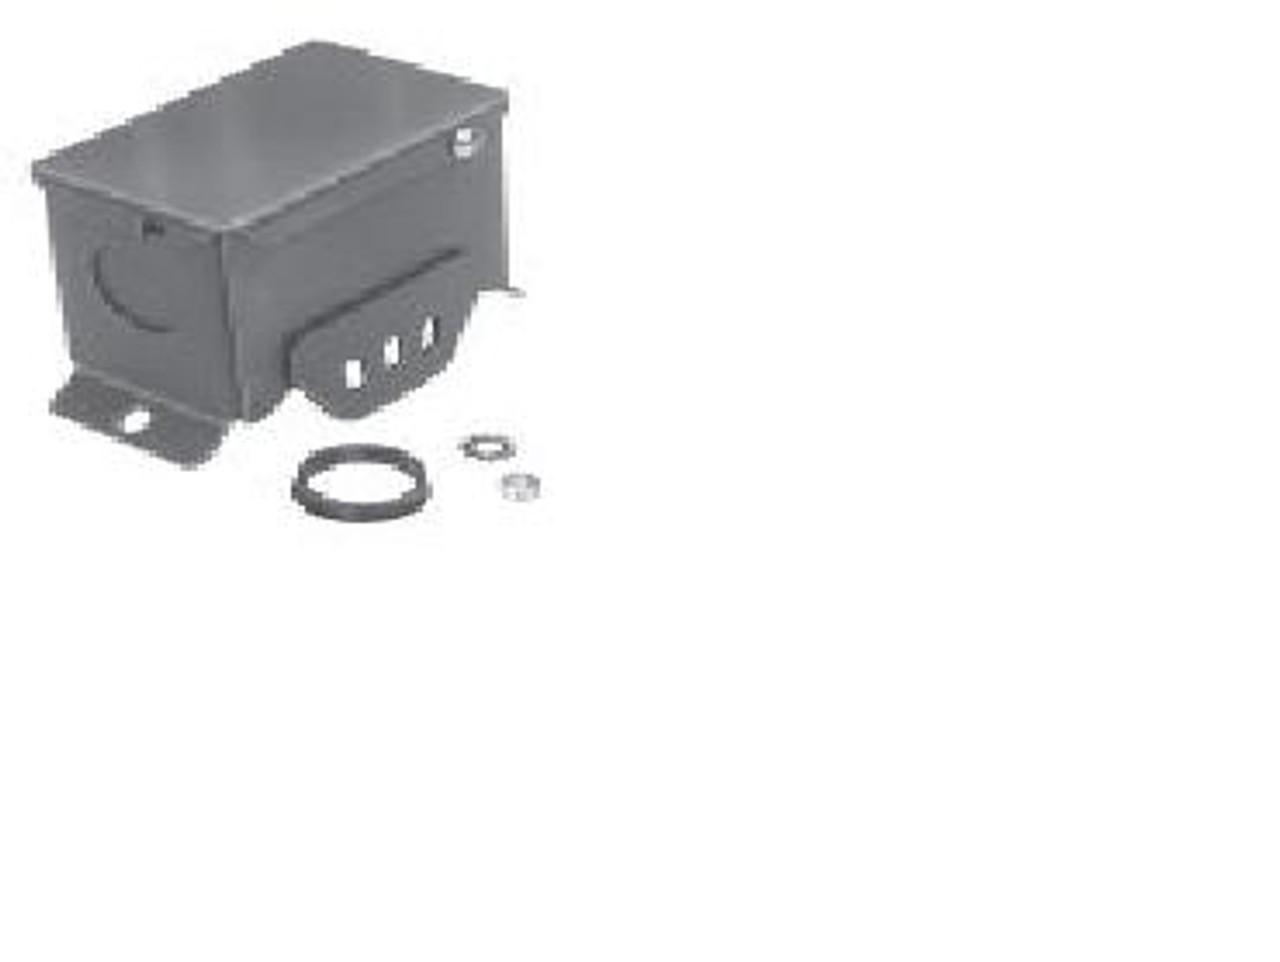 KIT144 Conduit Box